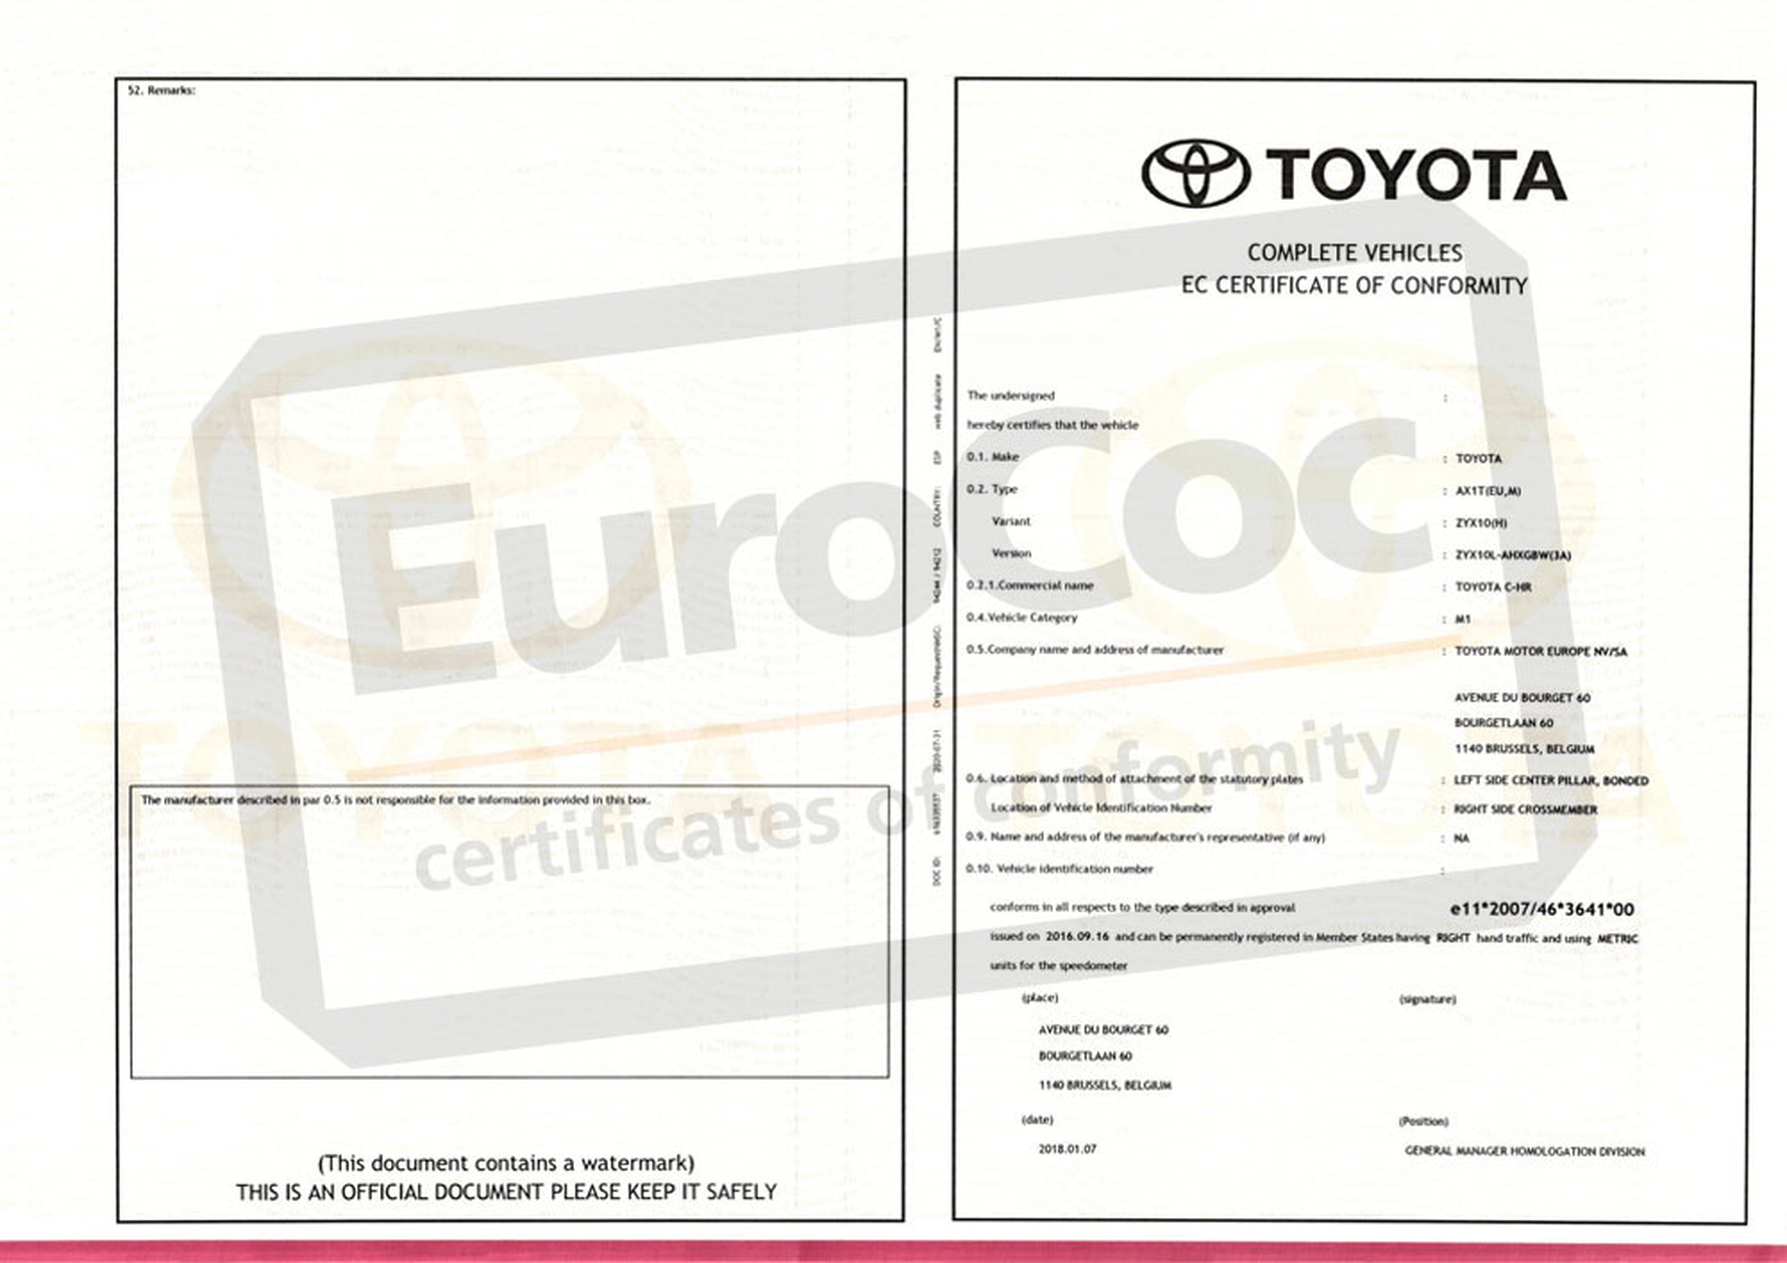 Certificate of conformity eurococ toyota certificate of conformity coc yadclub Image collections